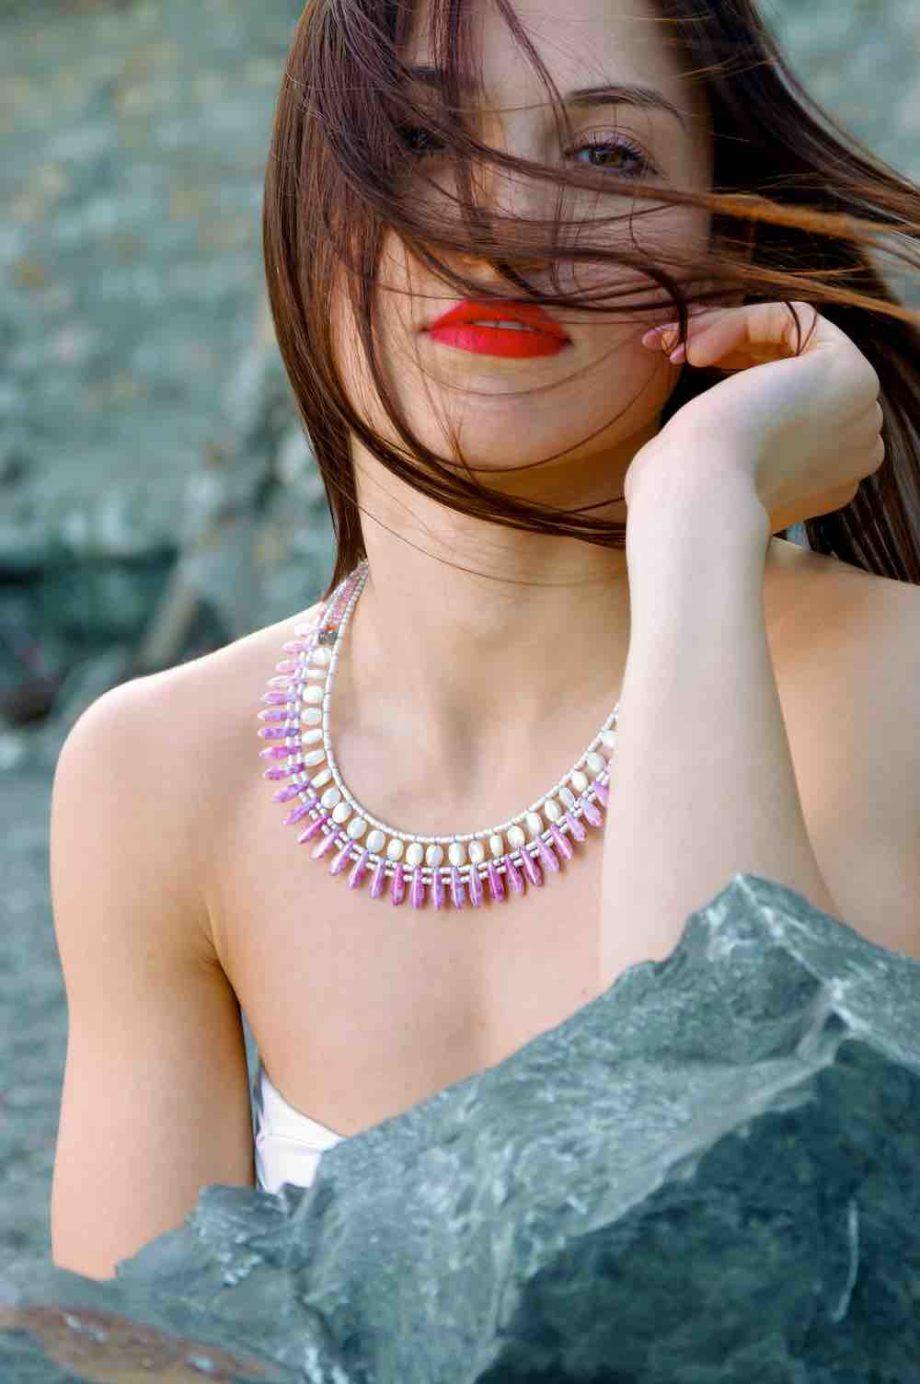 necklace mistinguett Pinky